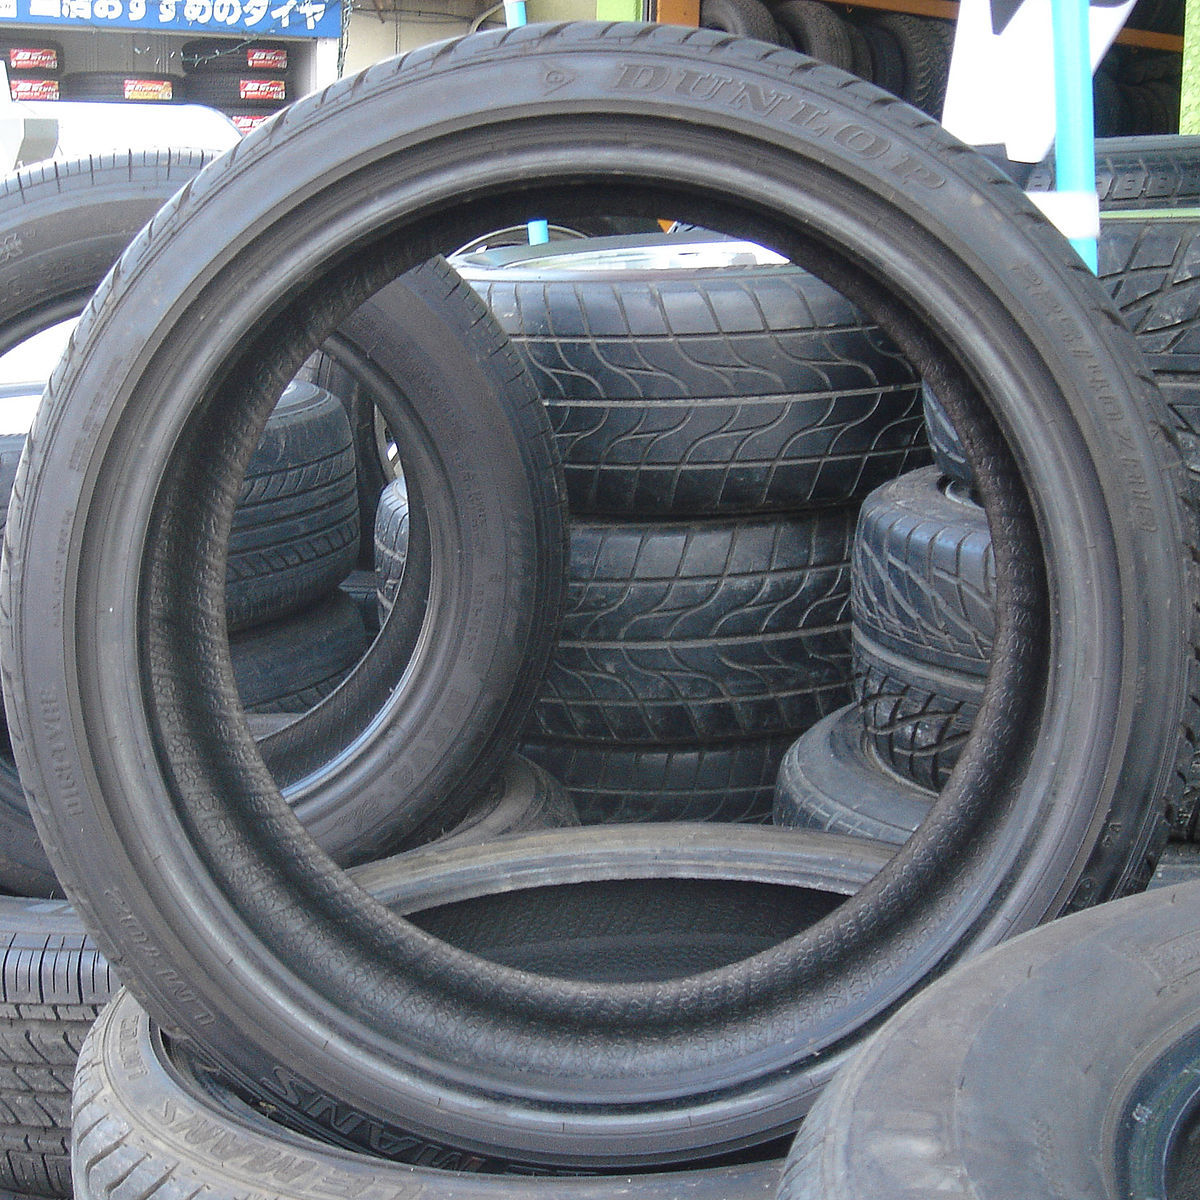 Car_tires.jpg